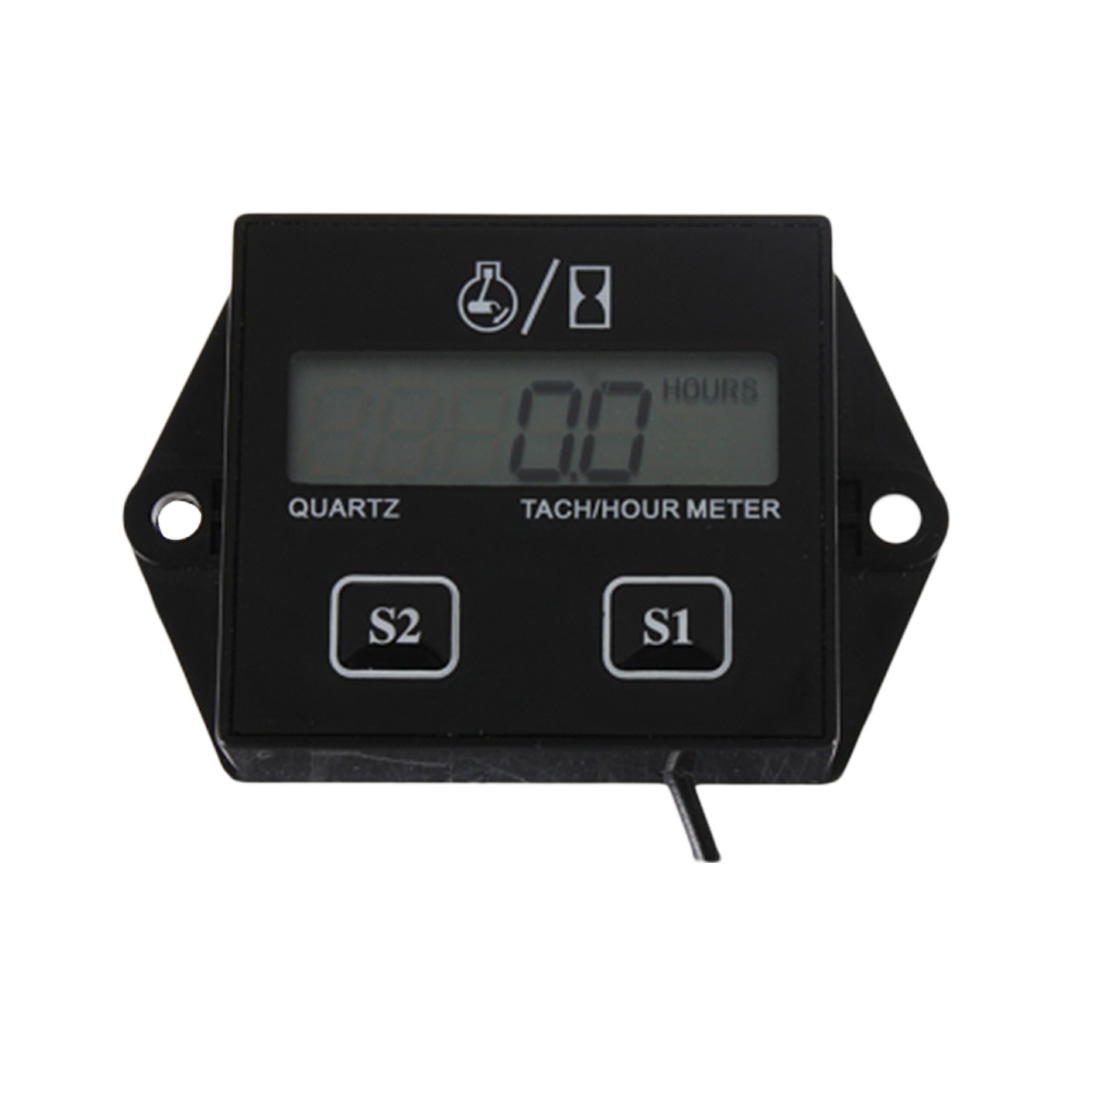 Hot 1 stück Hochwertige Digitale Motor Tech Betriebsstundenzähler Tachometer-lehre Induktive Für Motorrad Motor 4-takt-motor Funken